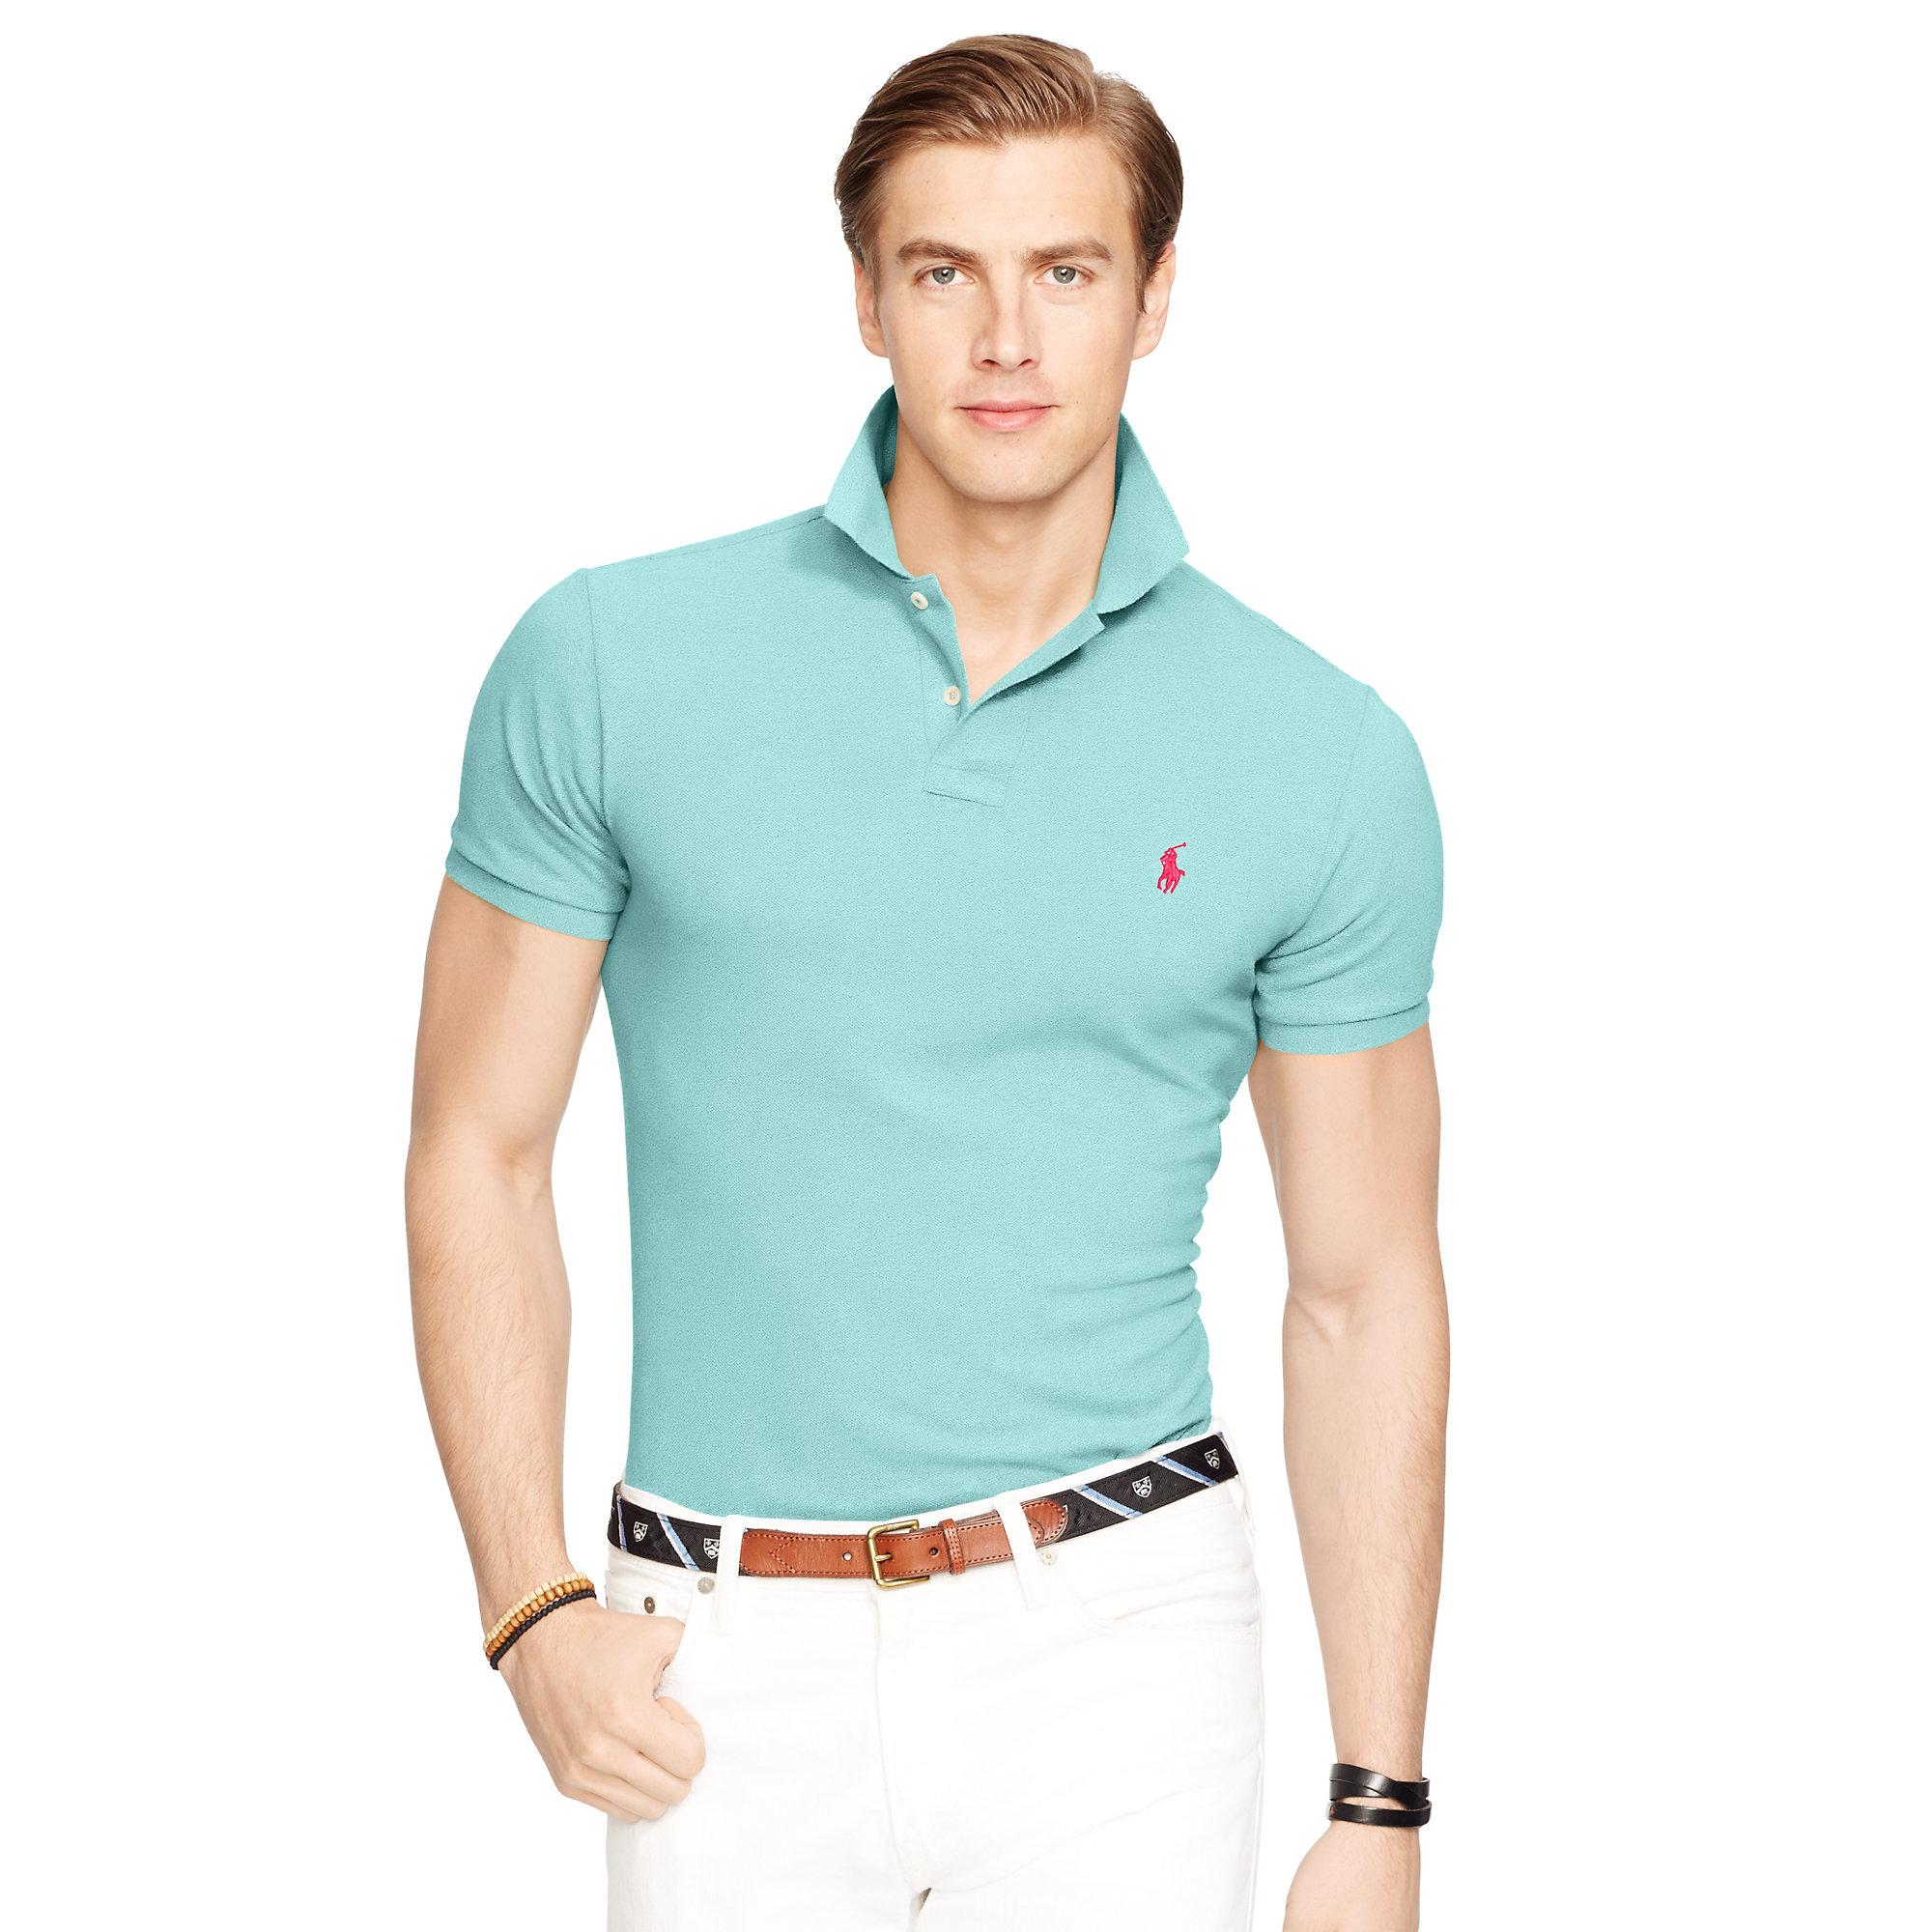 786b8ba9f7 Polo Ralph Lauren Slim-fit Mesh Polo Shirt in Blue for Men - Lyst